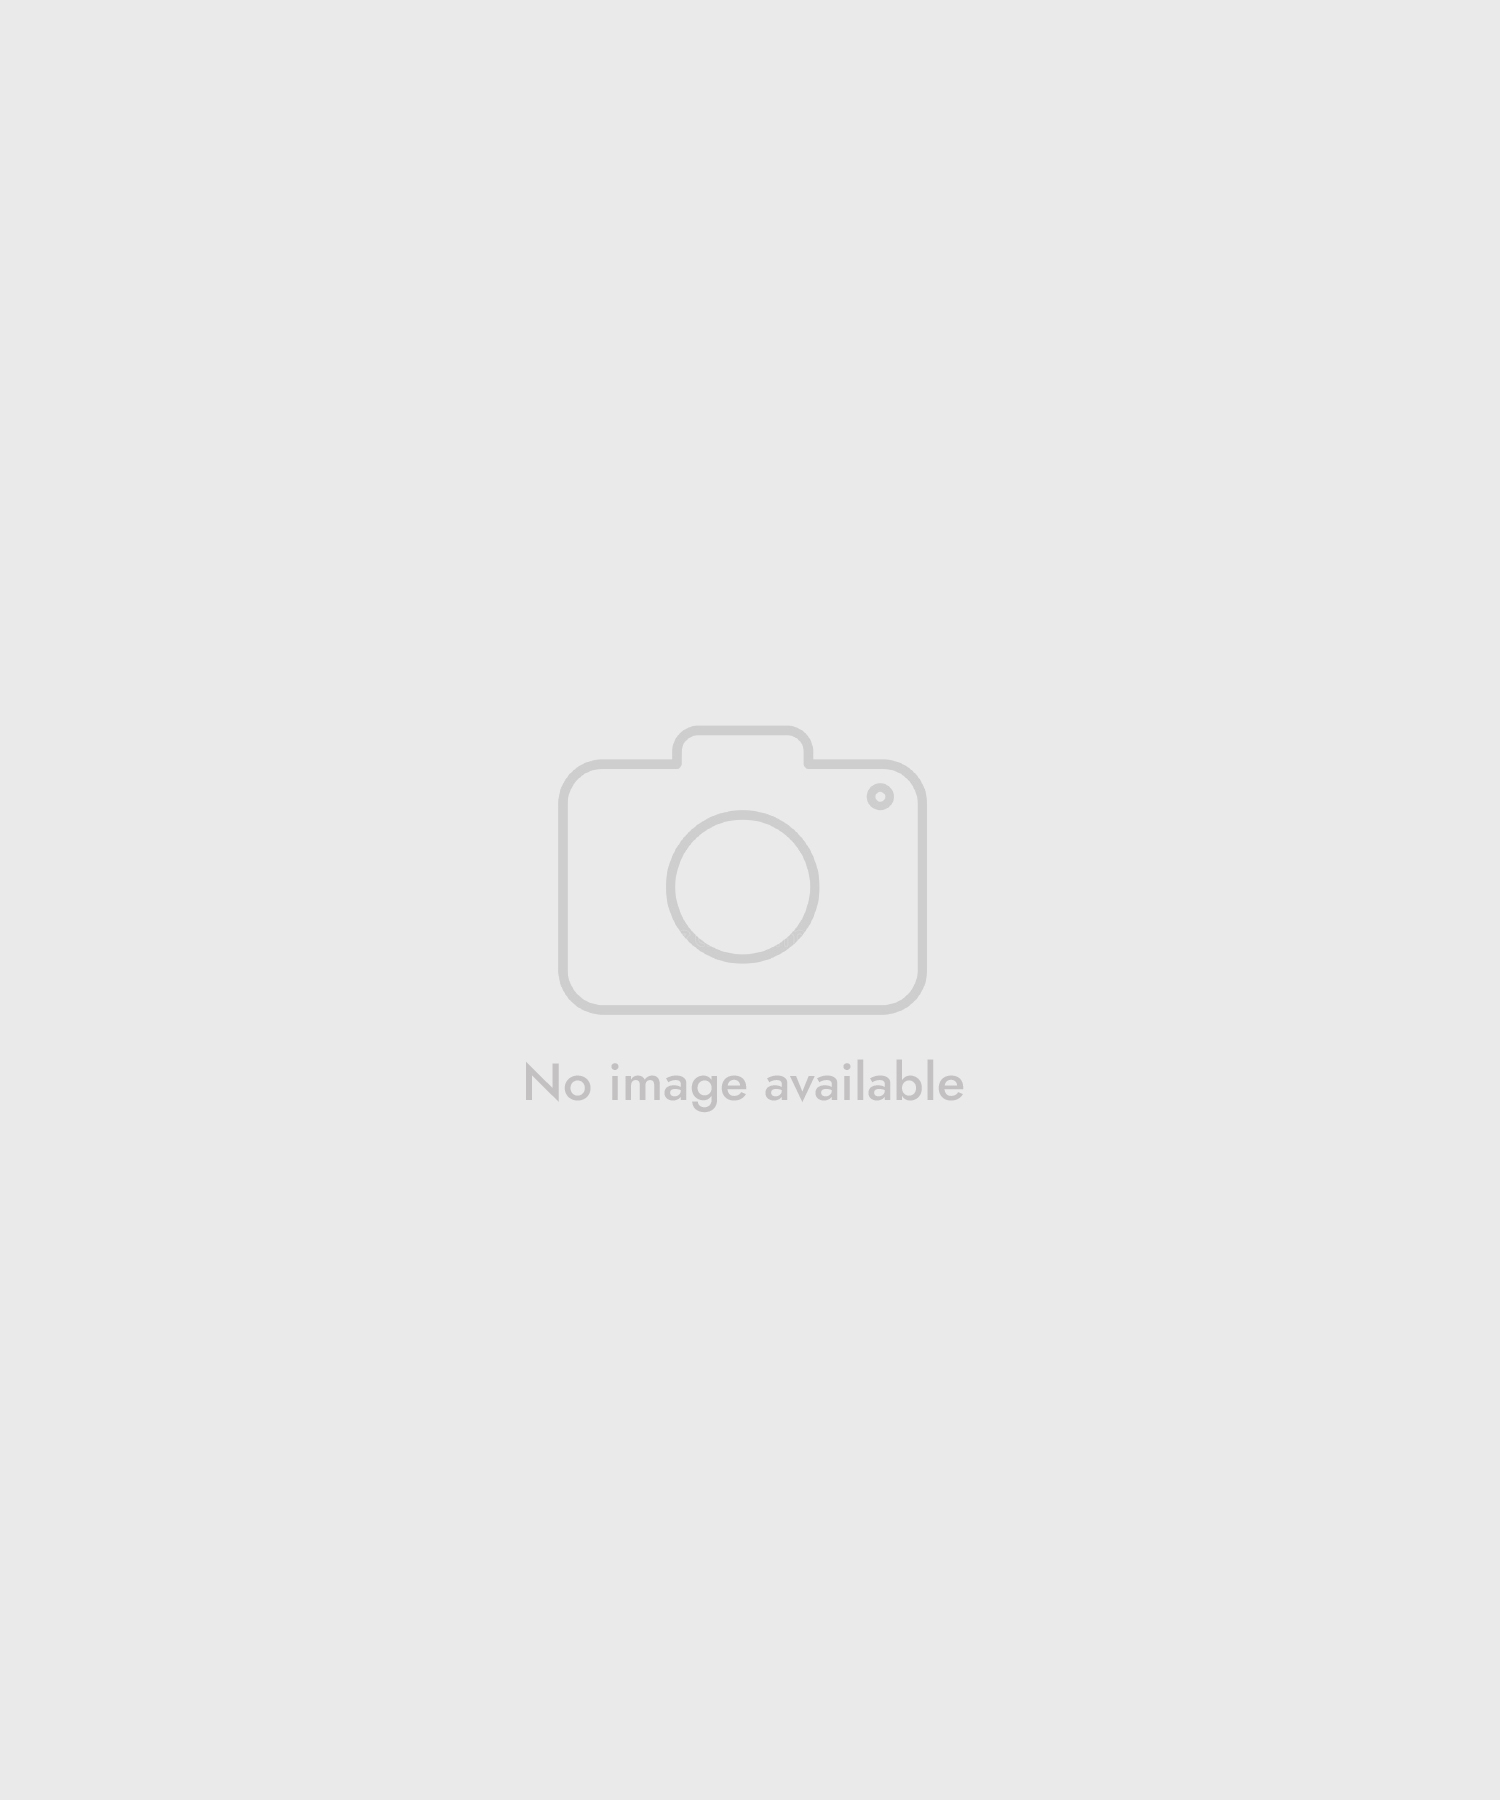 Złote baleriny damskie MRS-PVG KS107